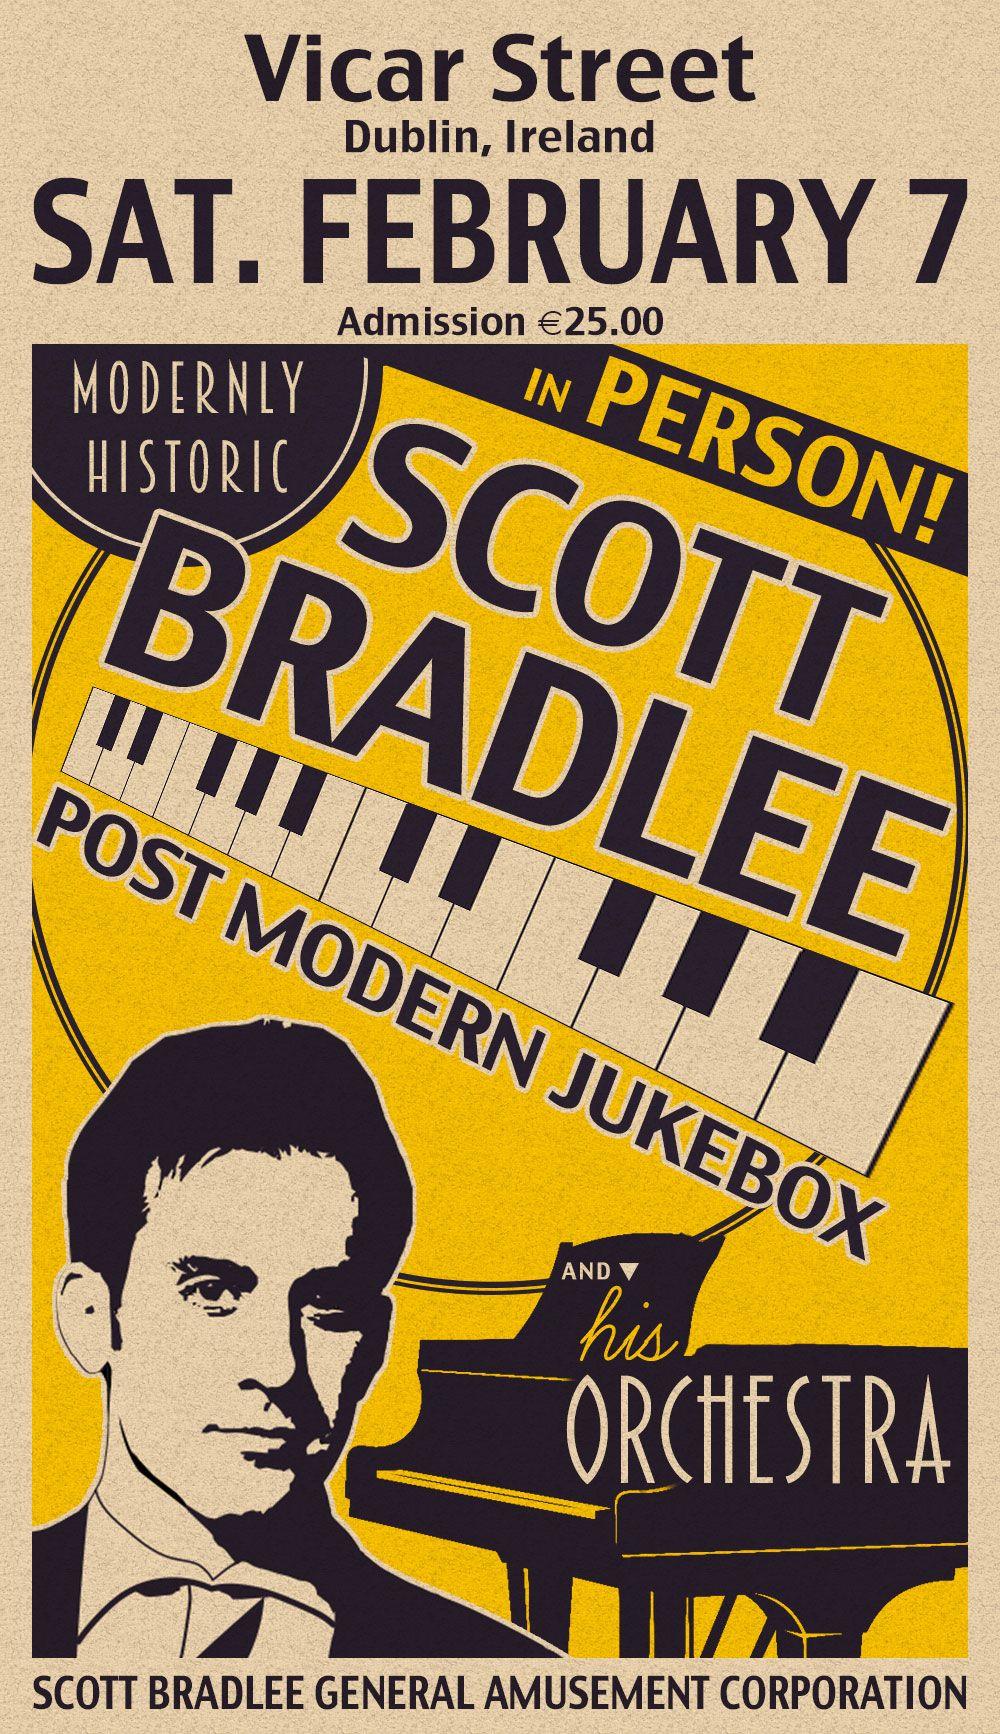 Scott Bradlee Event Poster